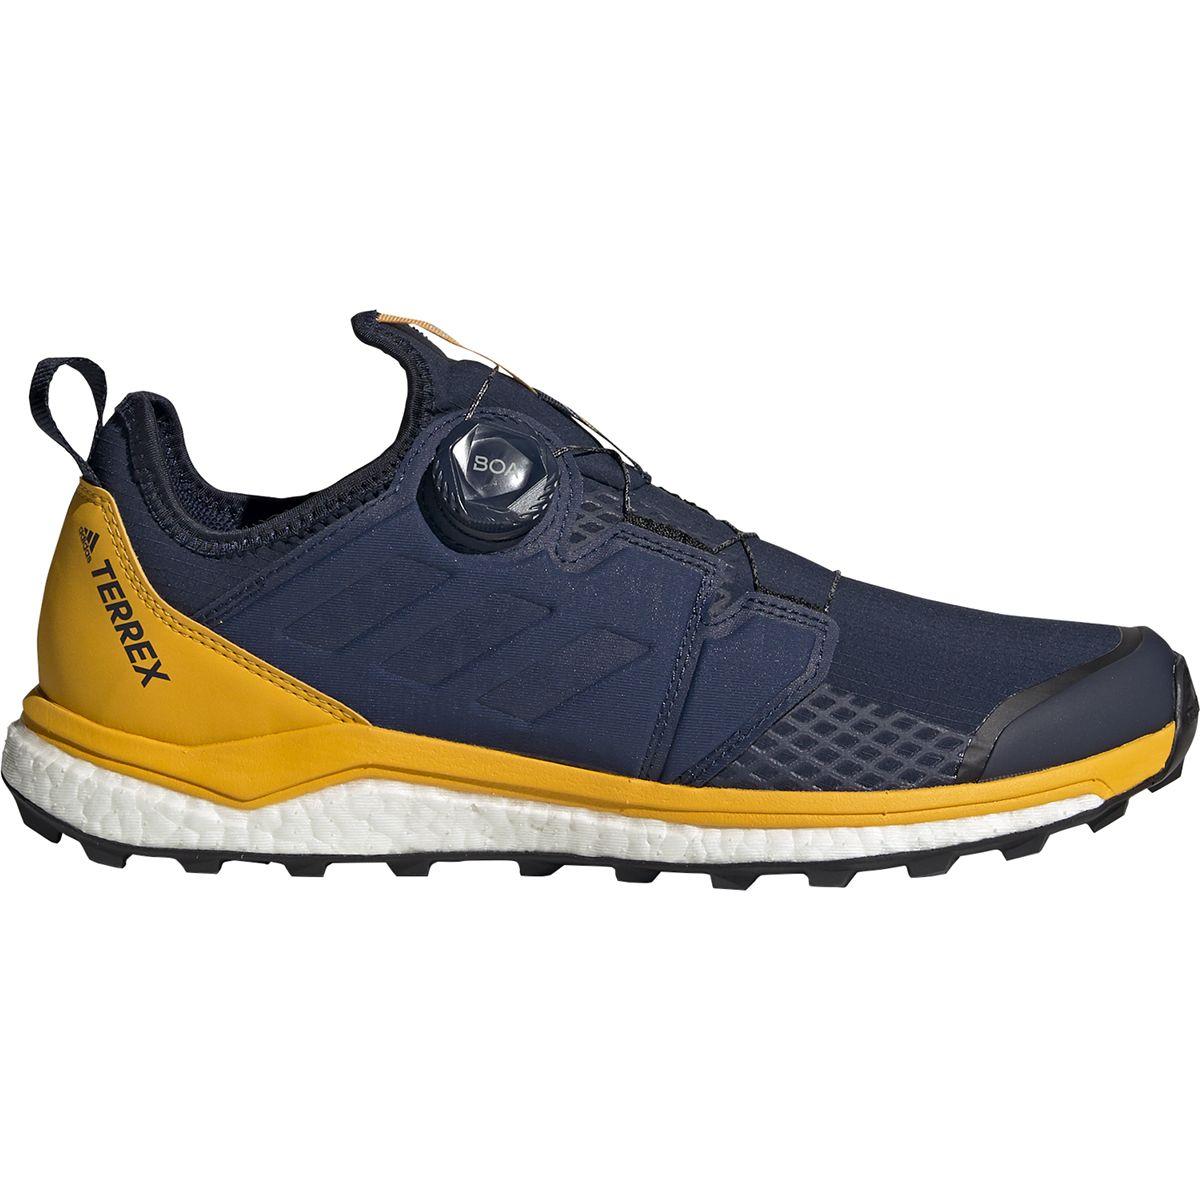 photo: Adidas Terrex Agravic trail running shoe